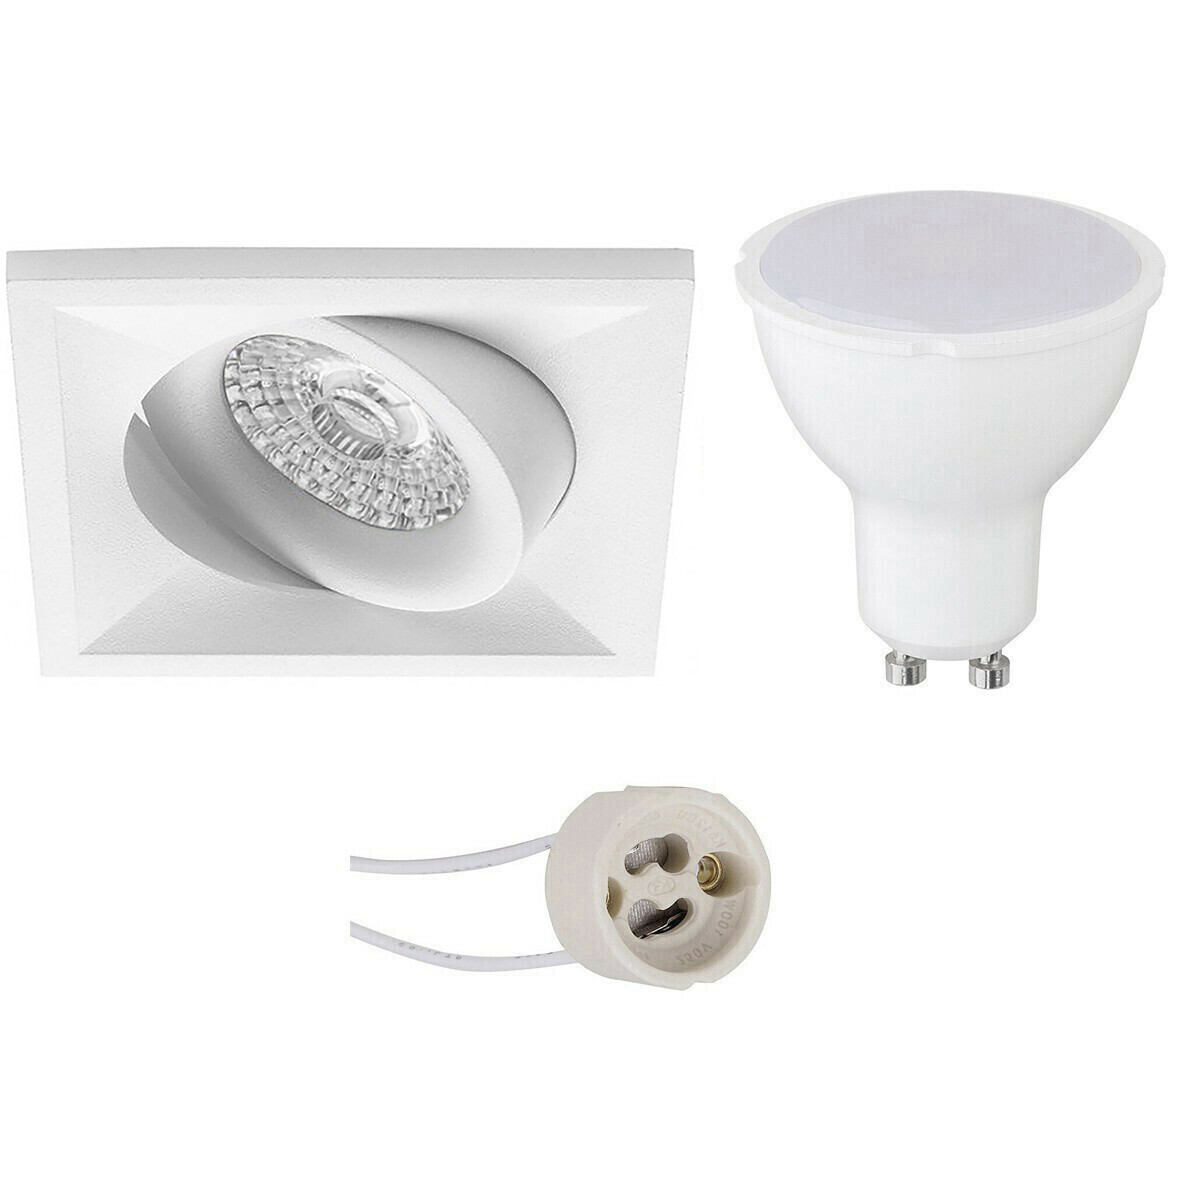 LED Spot Set - Pragmi Qiundo Pro - GU10 Fitting - Dimbaar - Inbouw Vierkant - Mat Wit - 6W - Natuurl